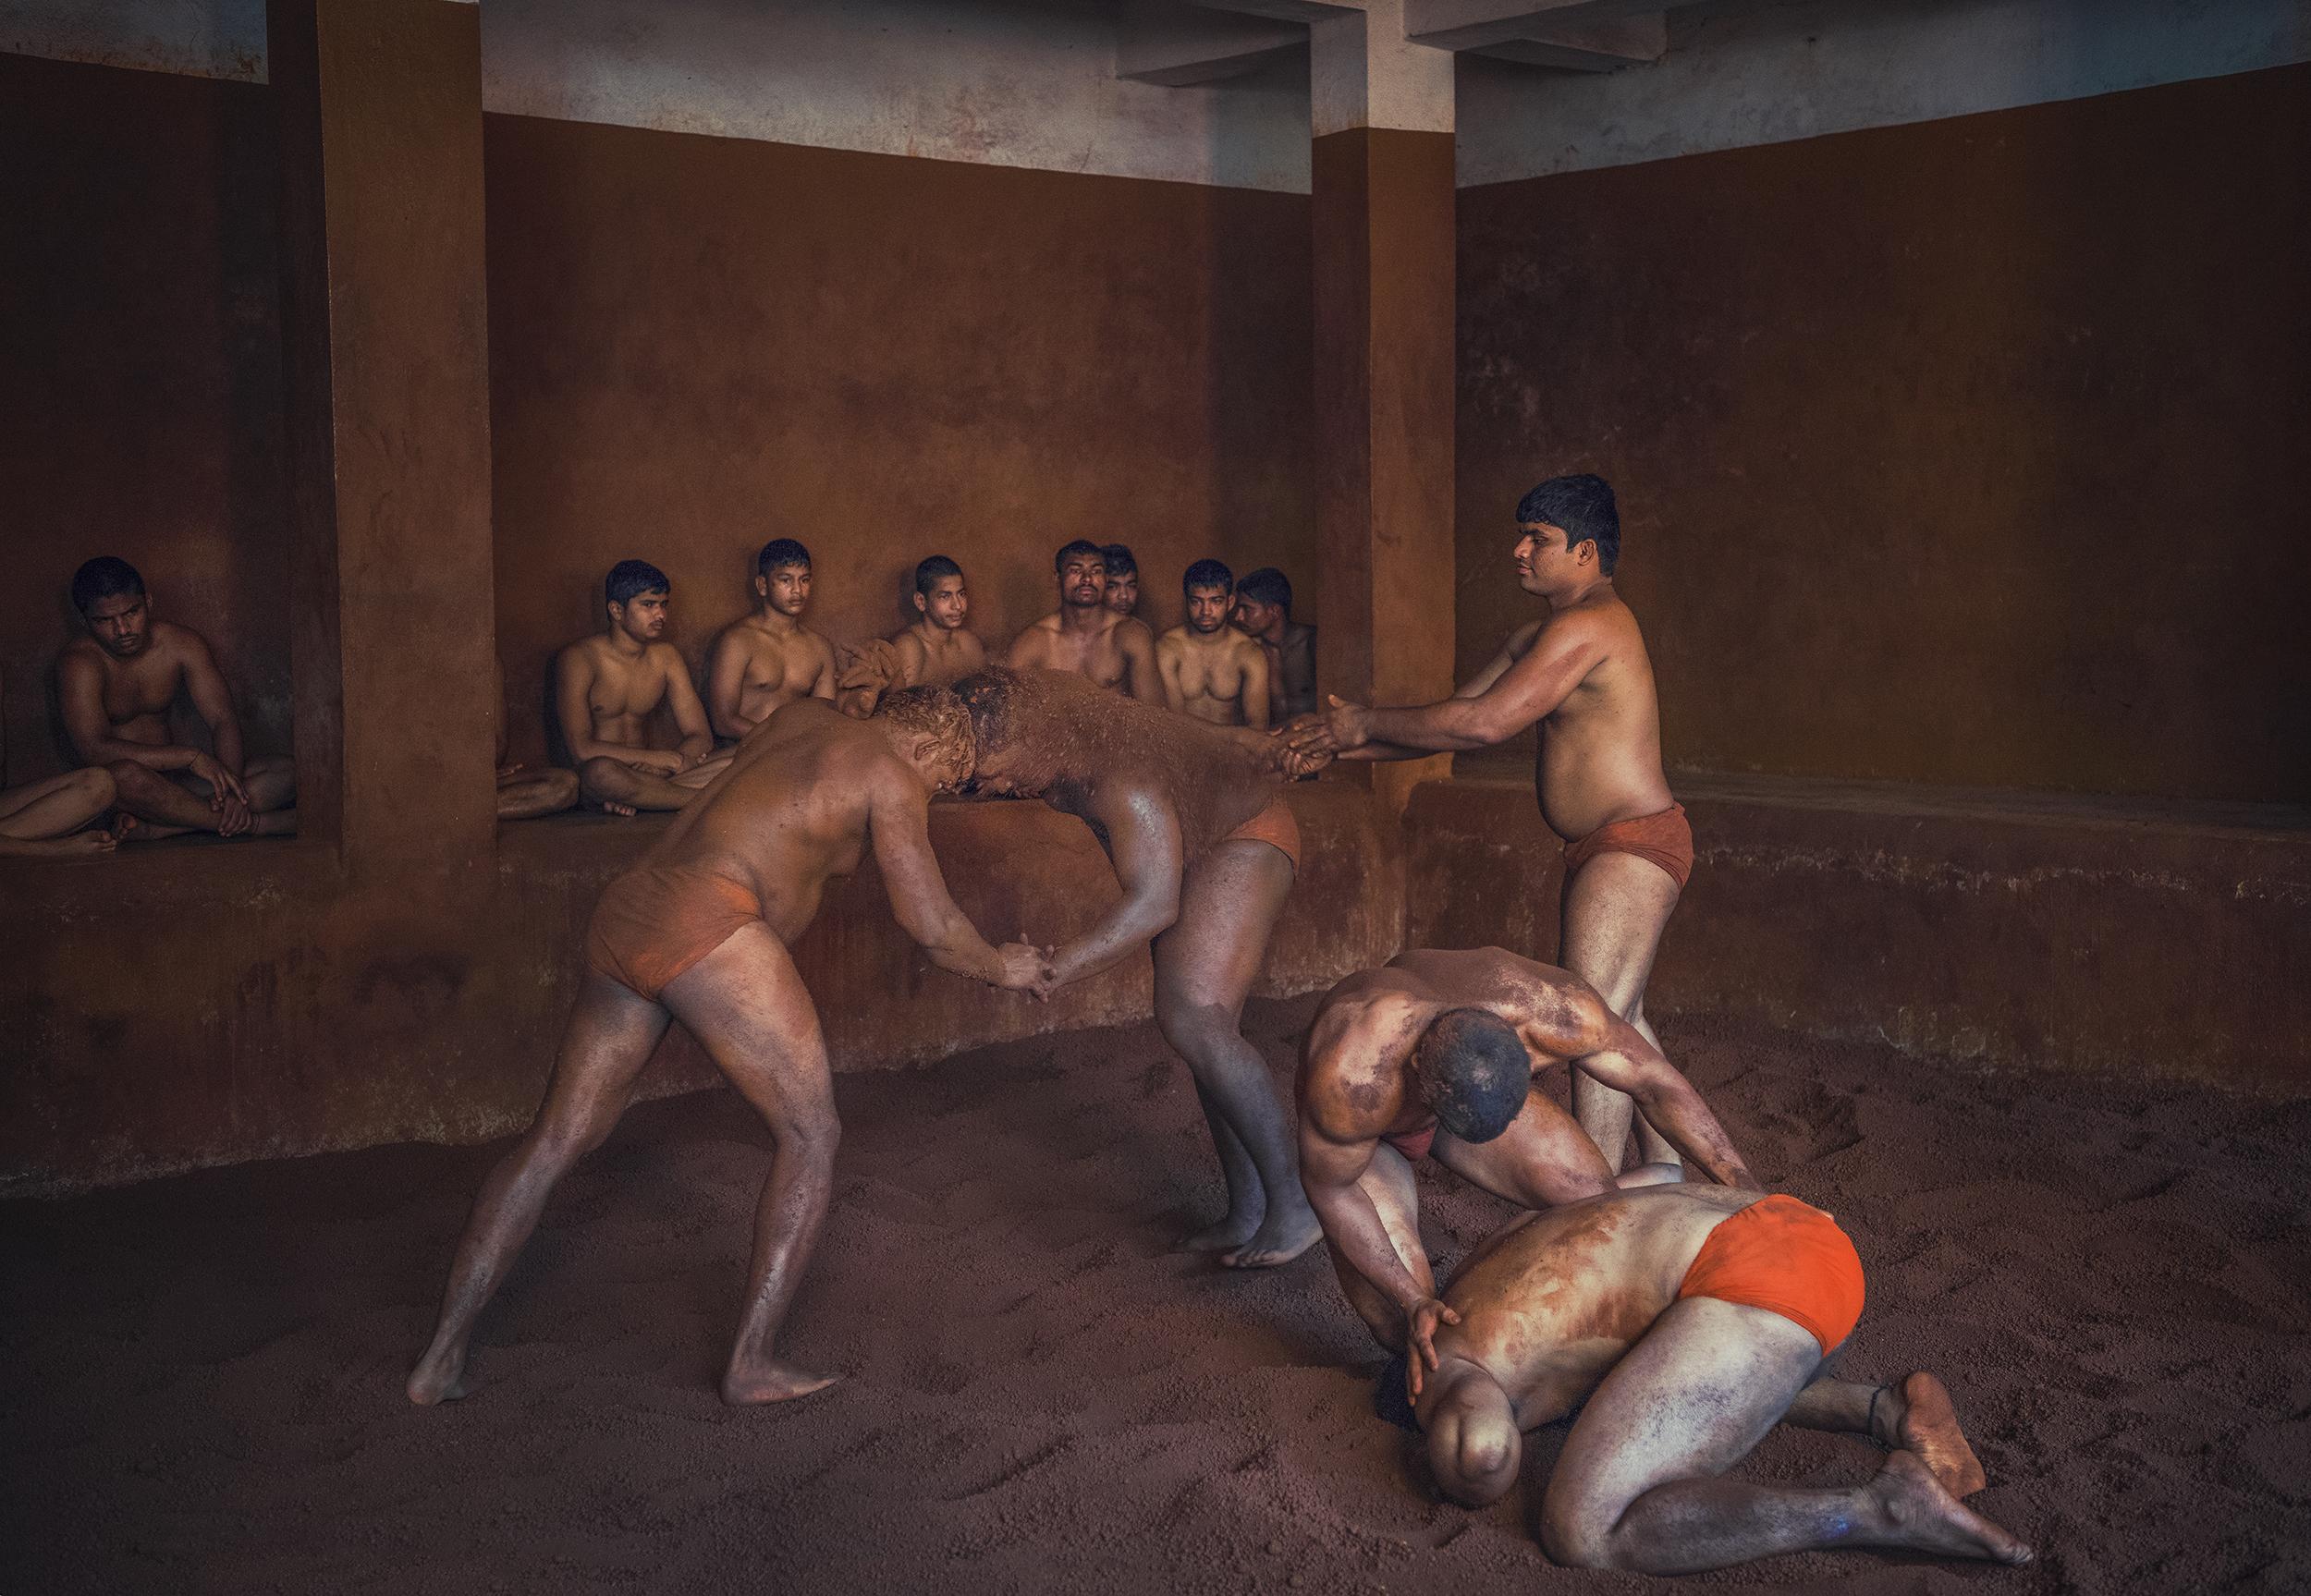 Wrestlers practicing